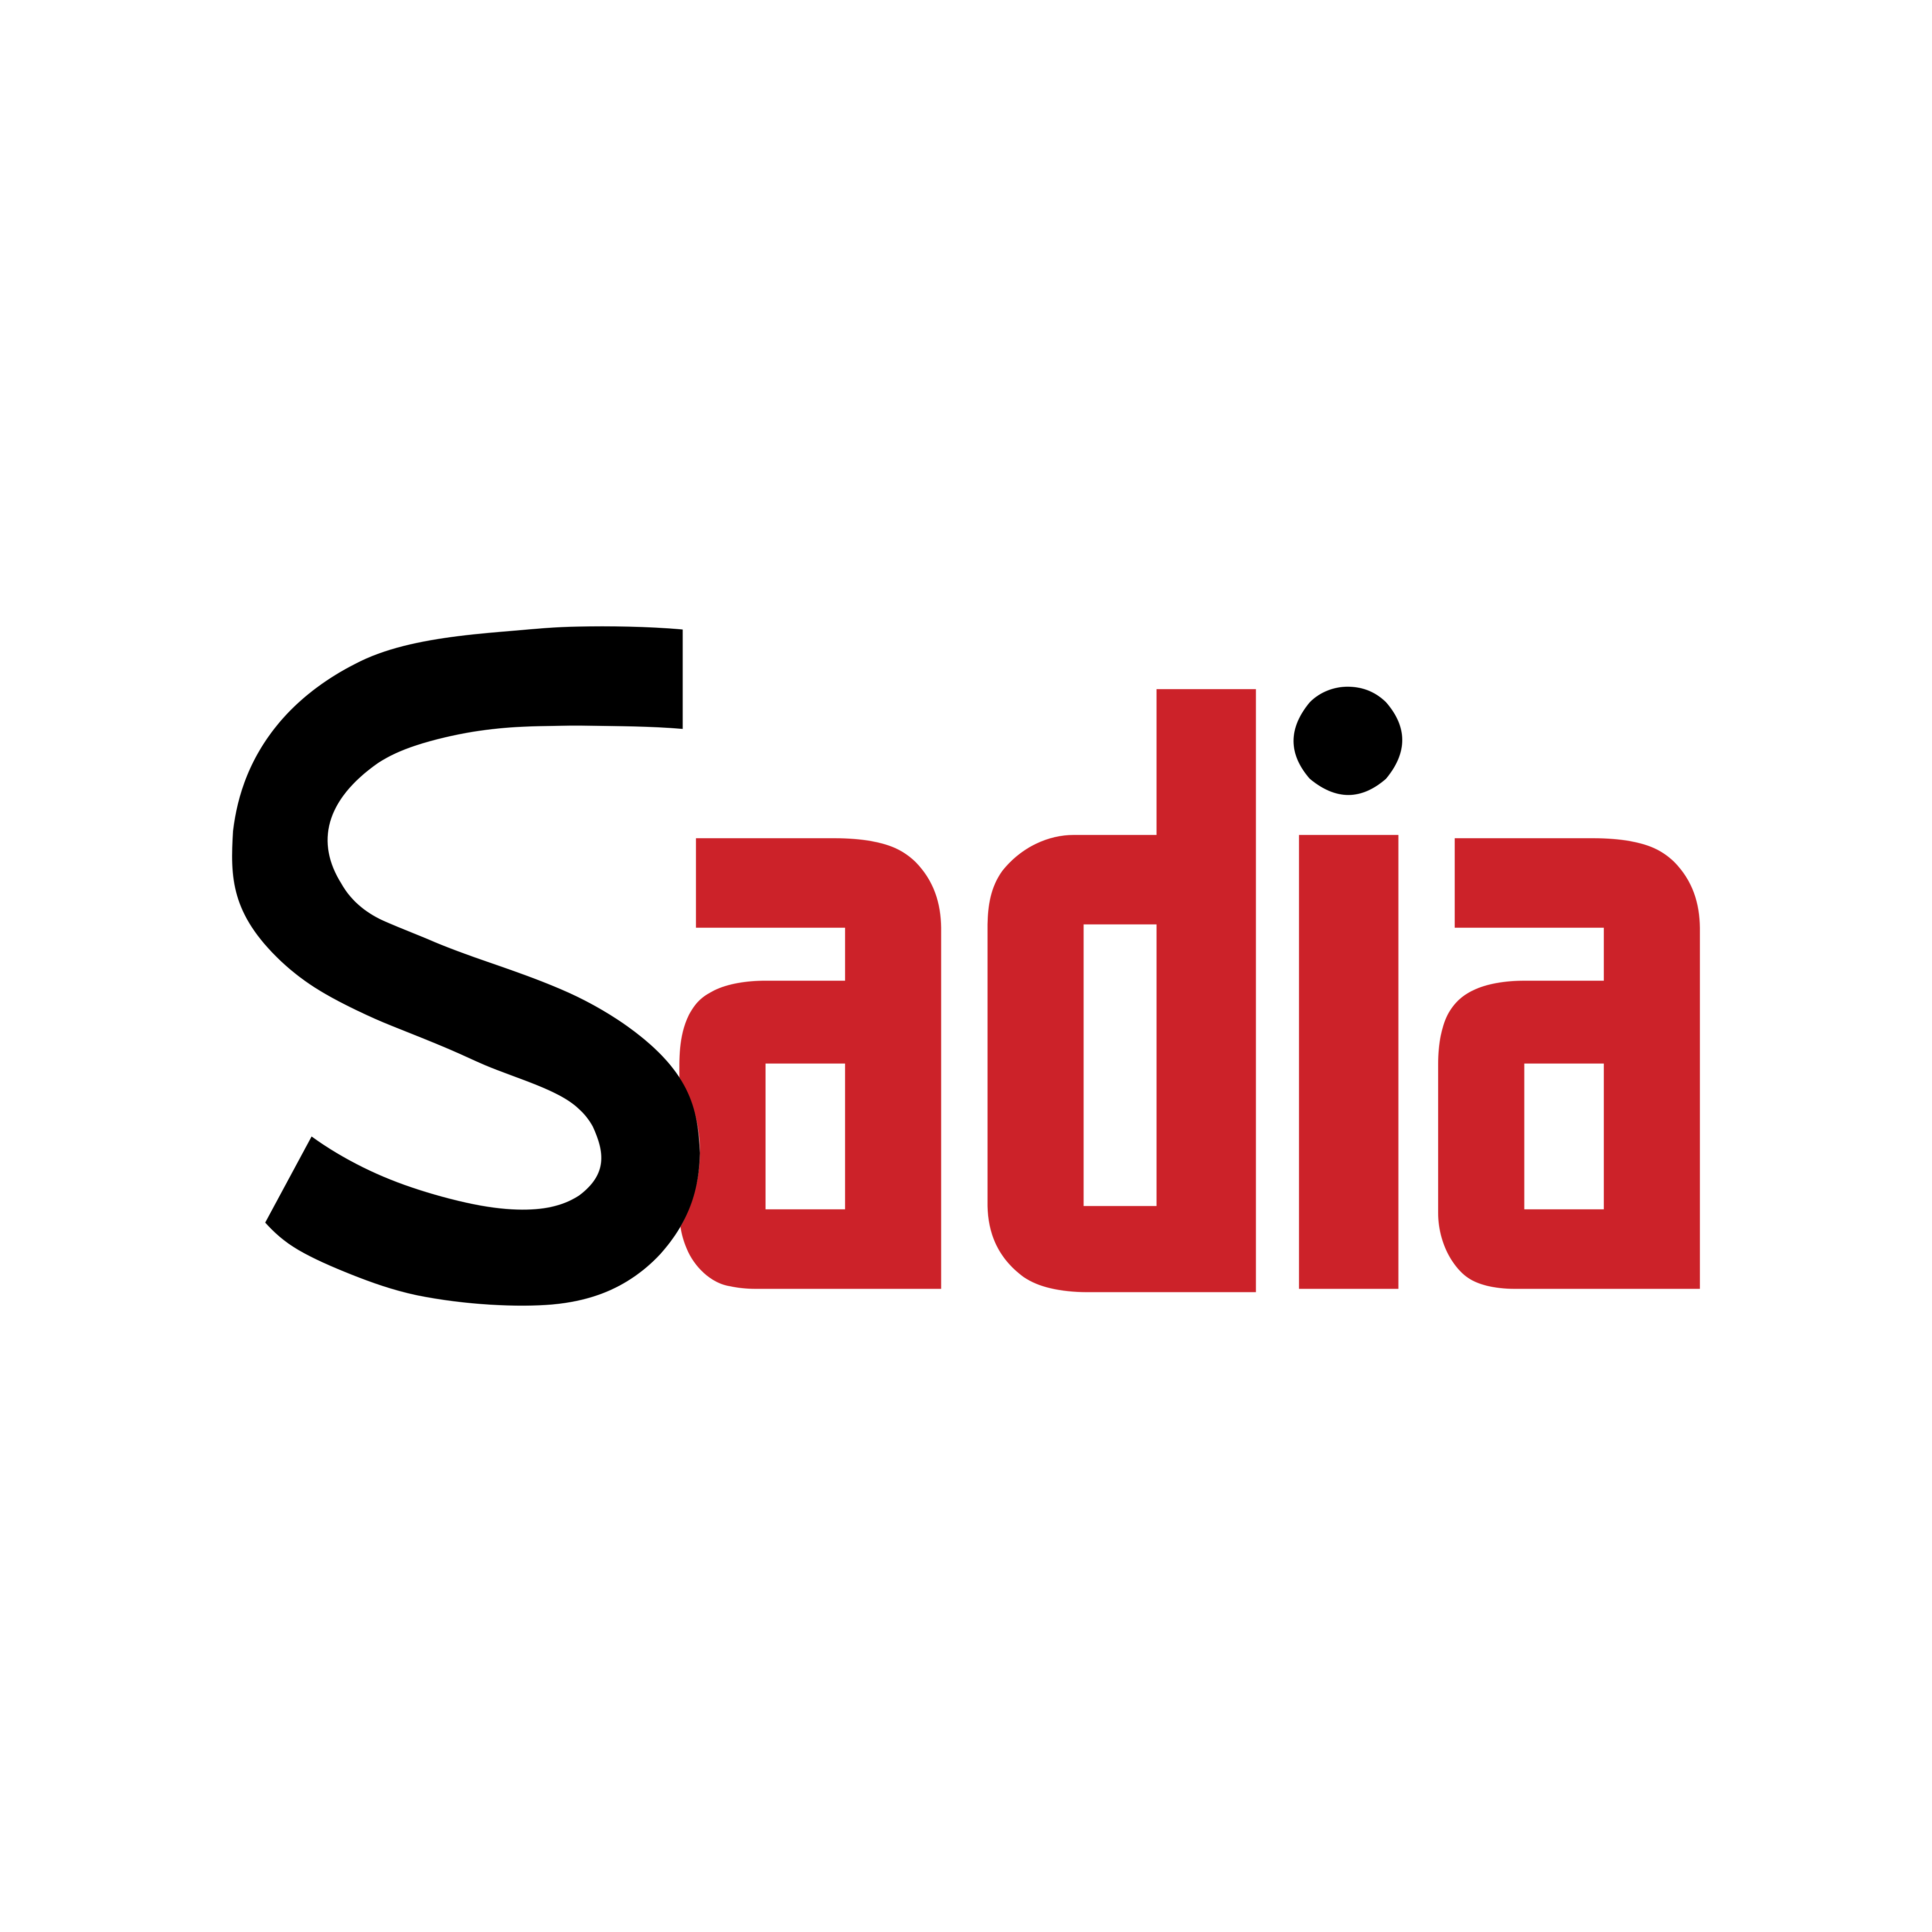 sadia logo 0 - Sadia Logo